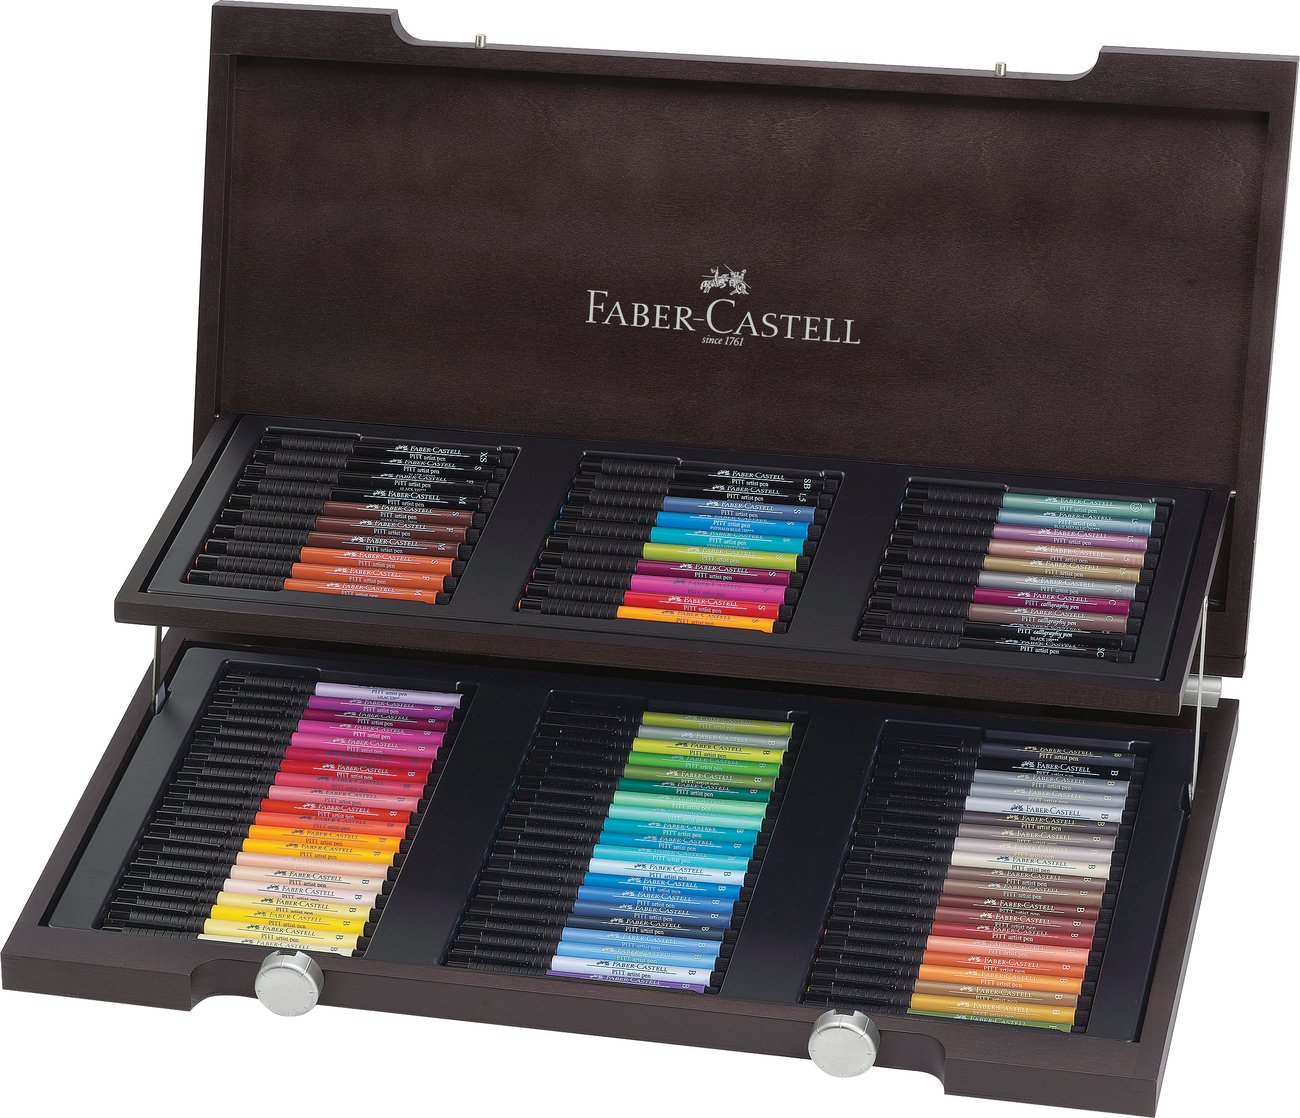 Faber-Castell Pitt Artist Pens Wood Case Gift Set - 90 Pens by Faber Castell